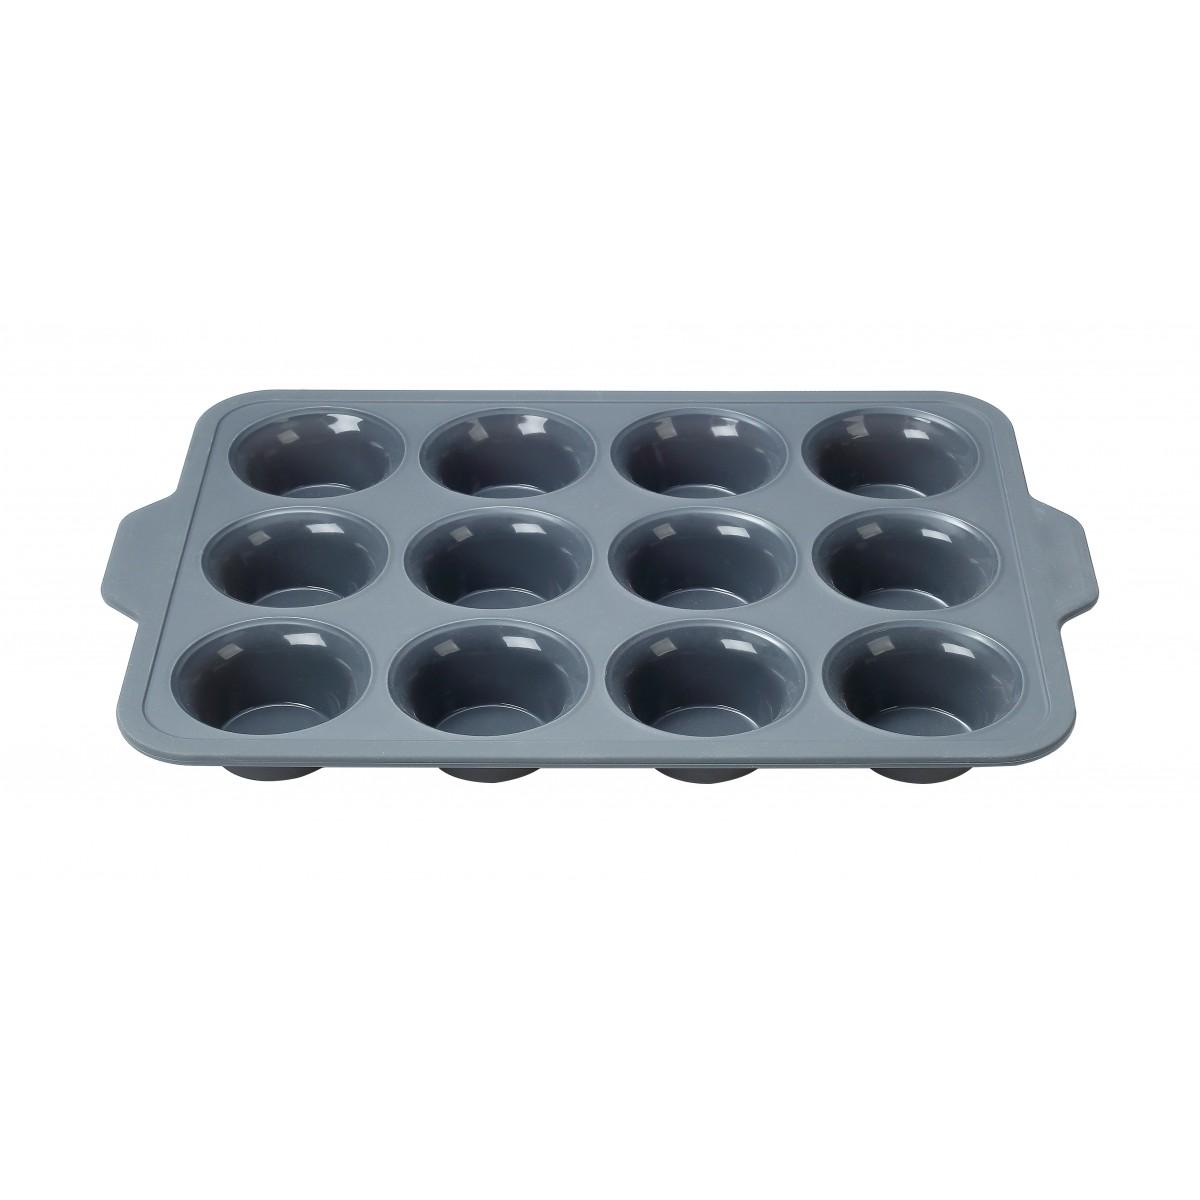 CONZEPT Muffinsform t/12 stk i silikone 39,8 x 26,6 x 4,3 cm